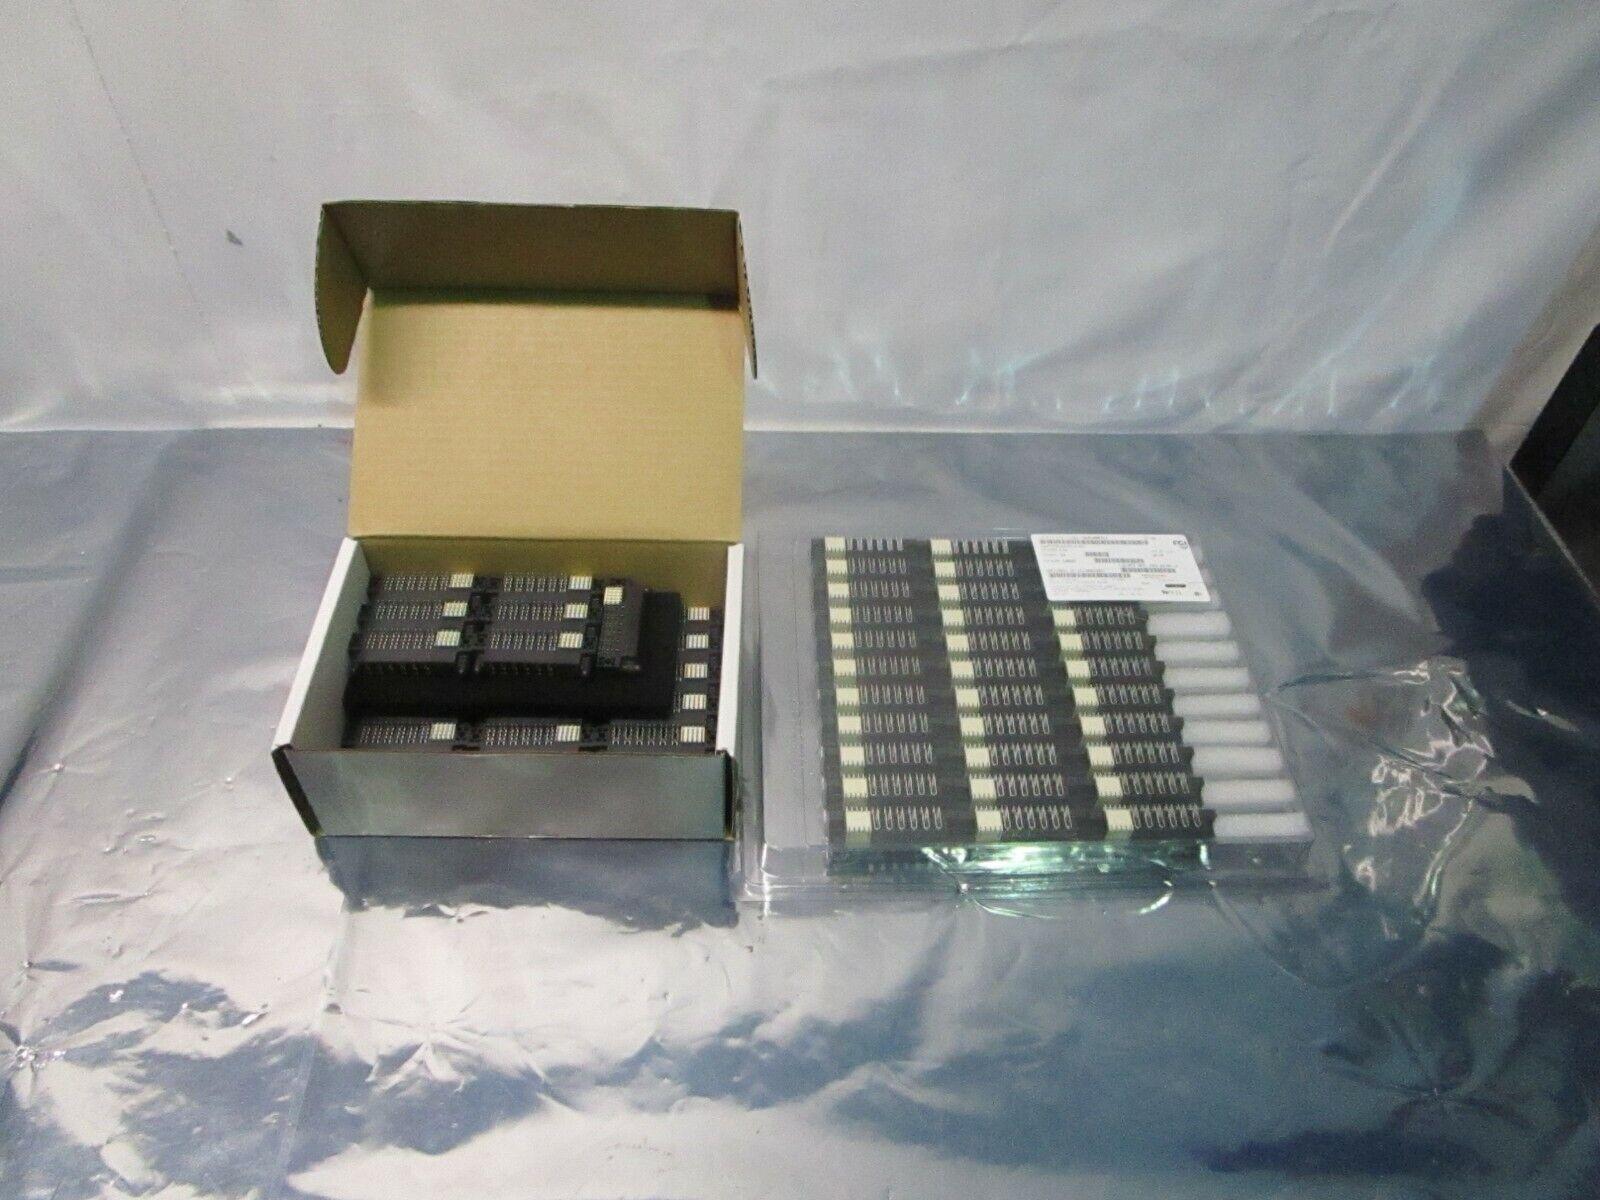 1 Lot of 58 FCI 51762-10602000CBLF PWRBLADE R/A LF REC, 102319